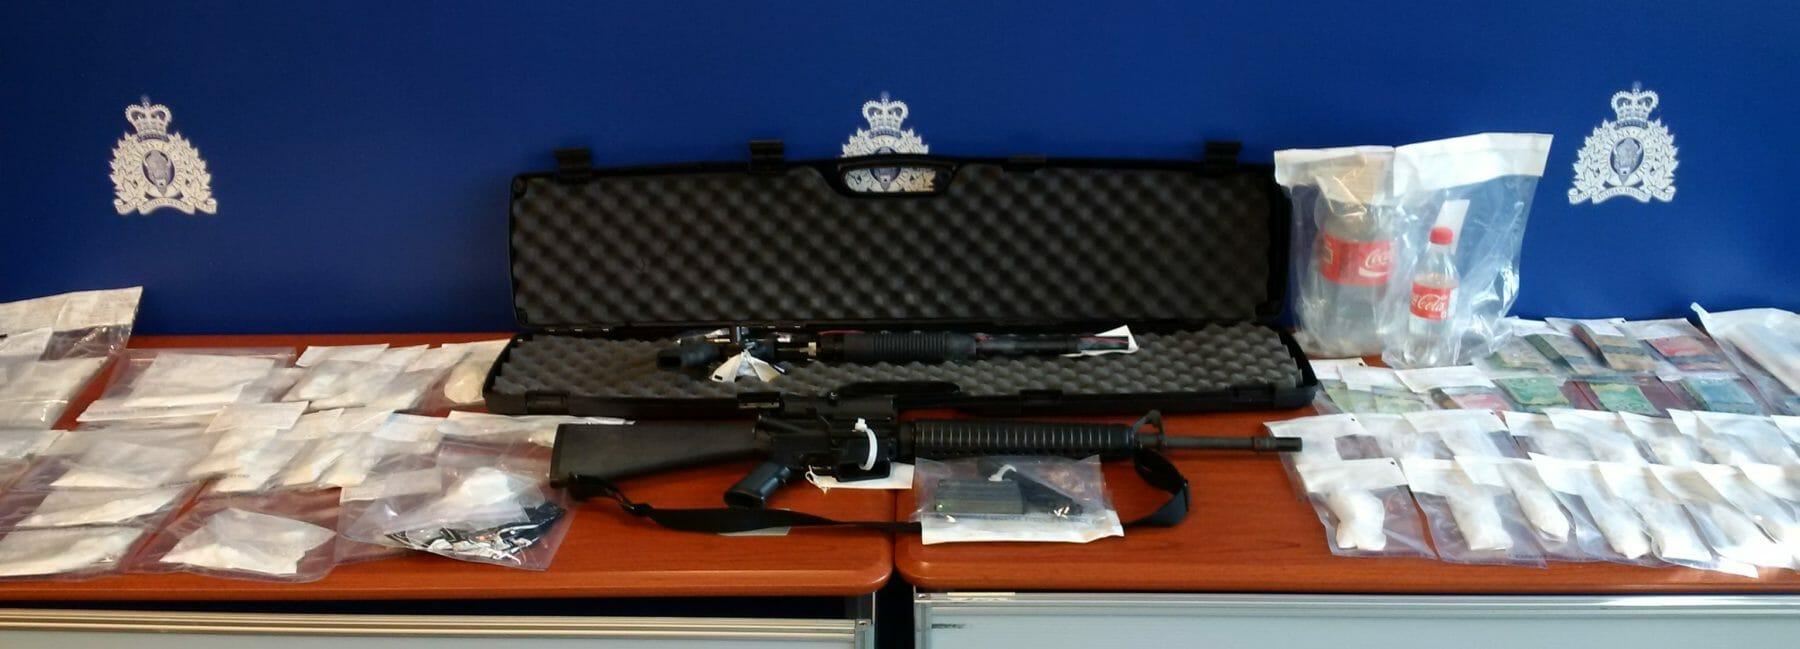 Guns and Drugs - display